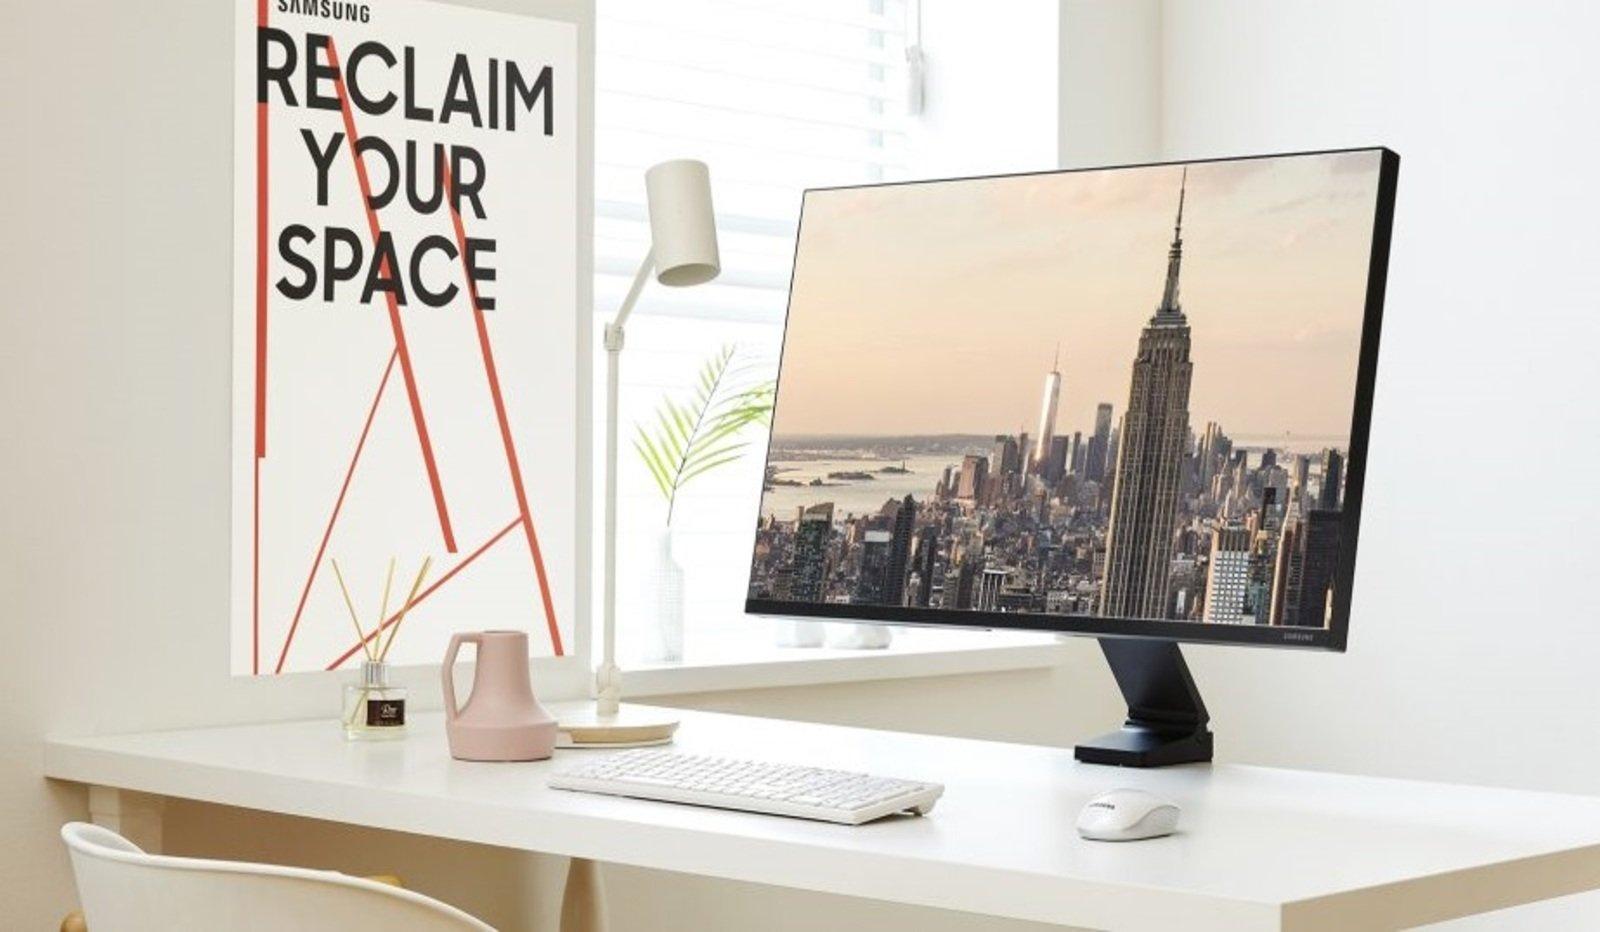 CES 2019 : écran Samsung Space Monitor